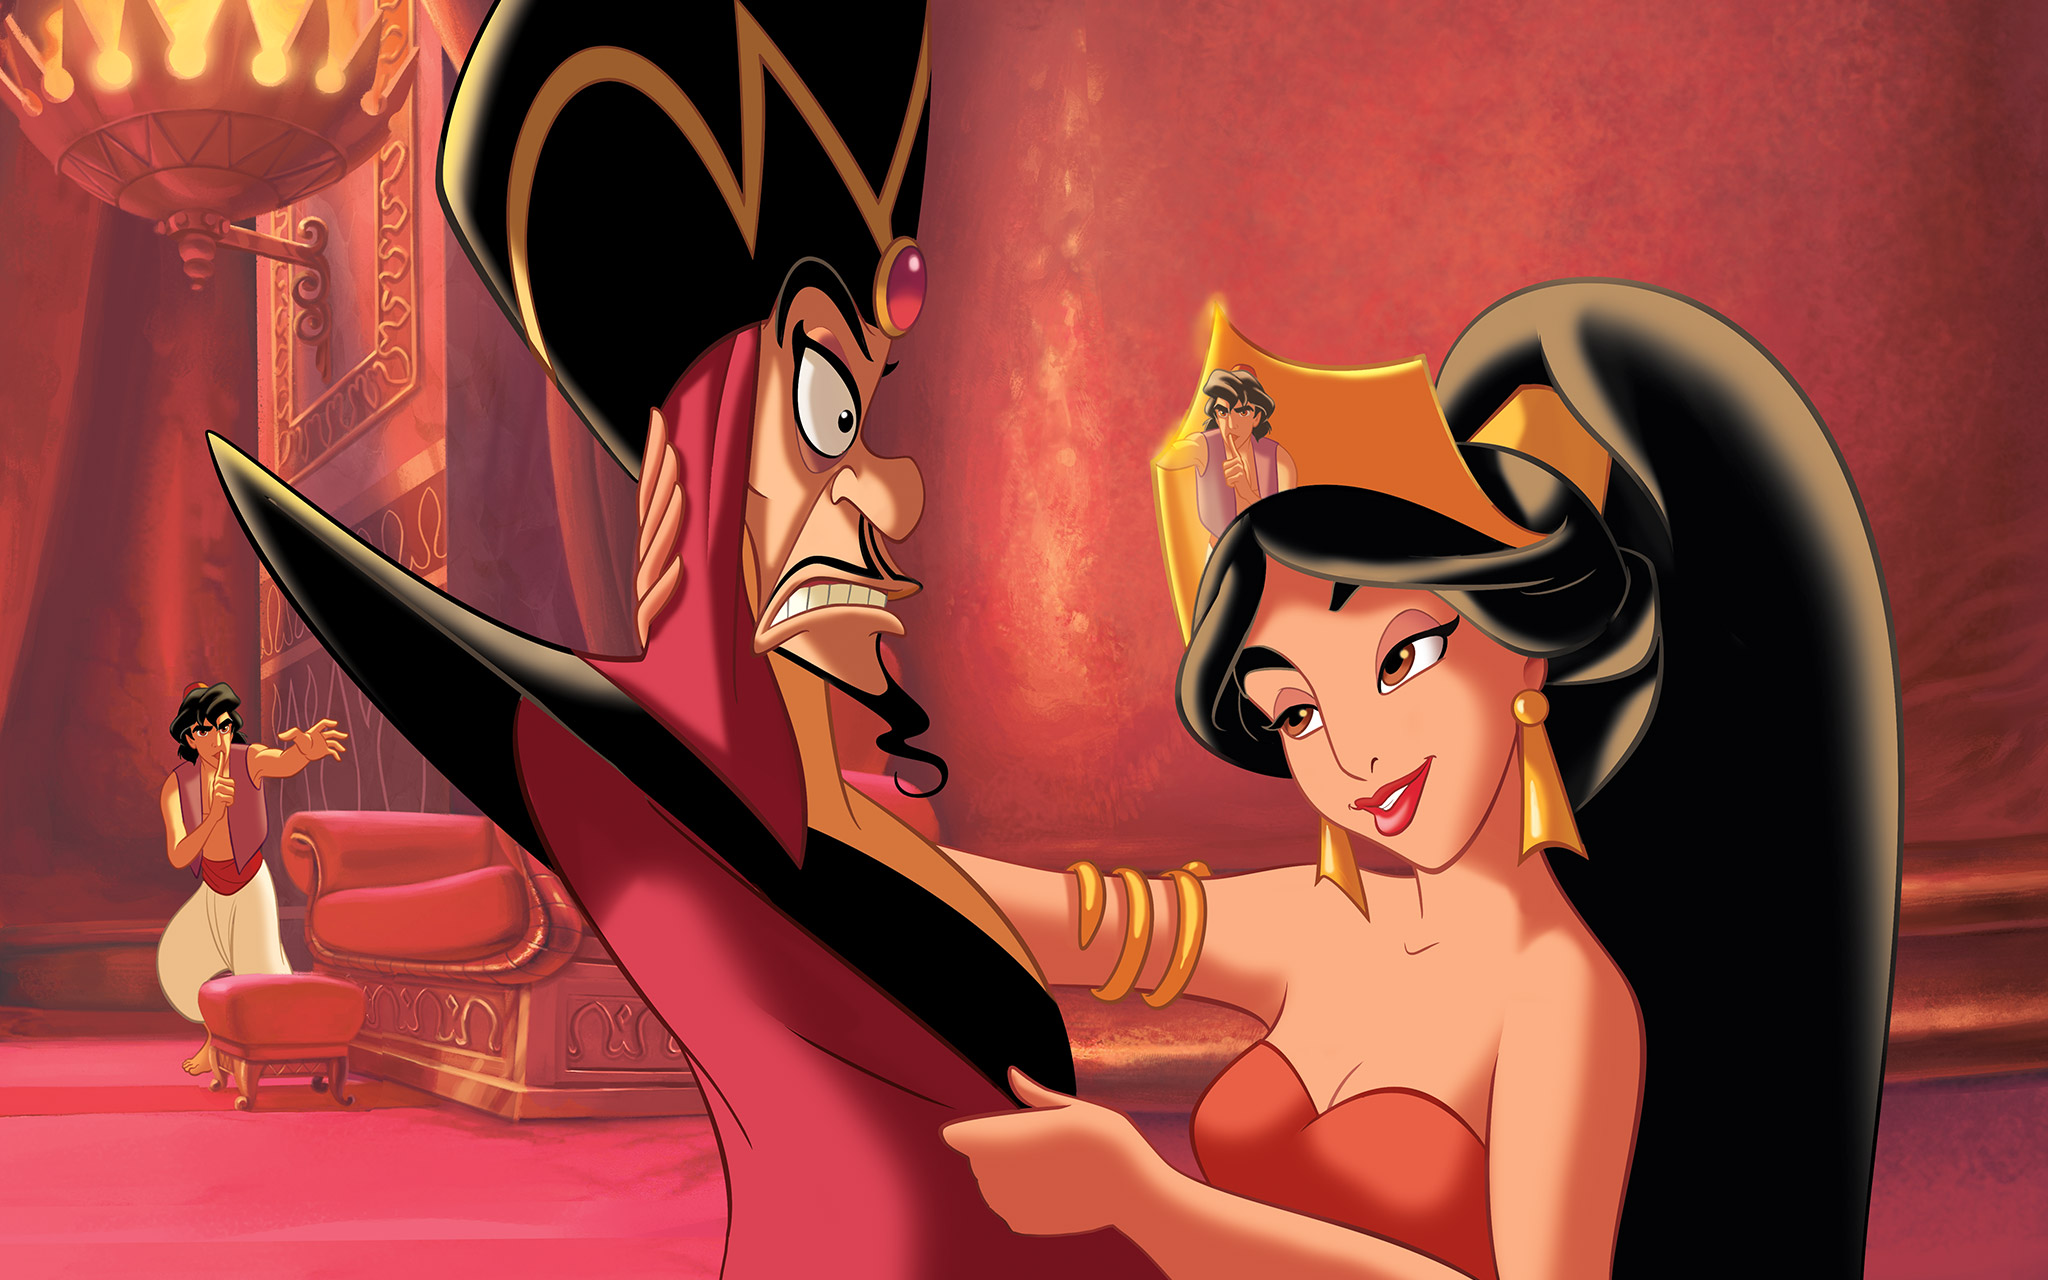 Aladin Masuk ke Istana Mencoba menolong Putri Jasmine